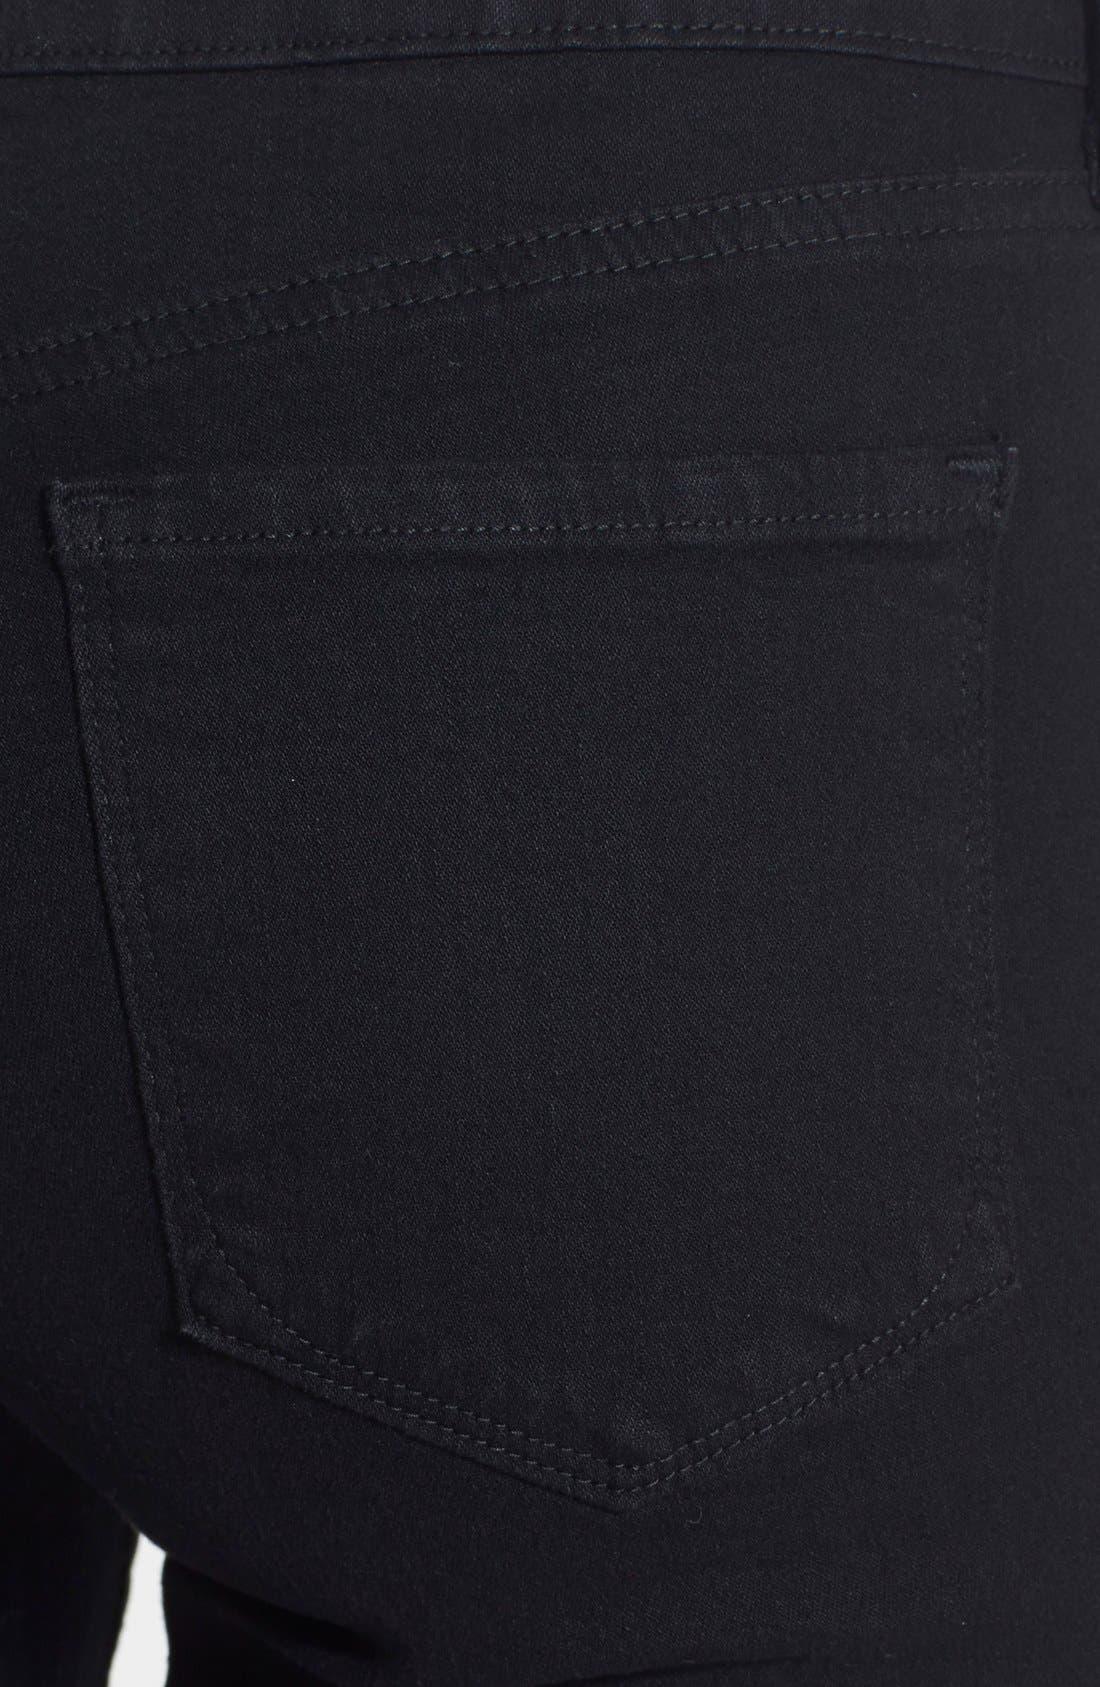 NYDJ, 'Billie' Stretch Mini Bootcut Jeans, Alternate thumbnail 3, color, BLACK